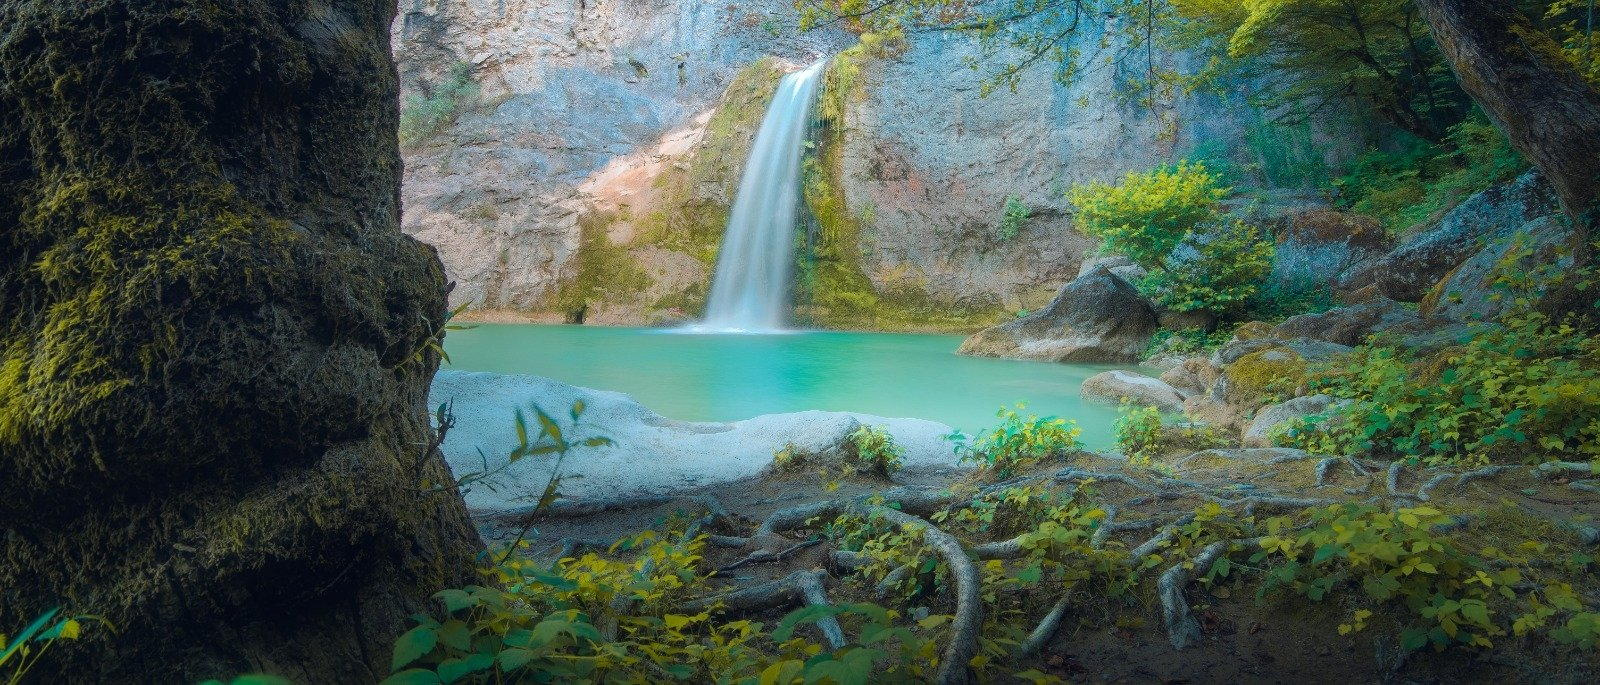 The Horma Canyon. (AA Photo)